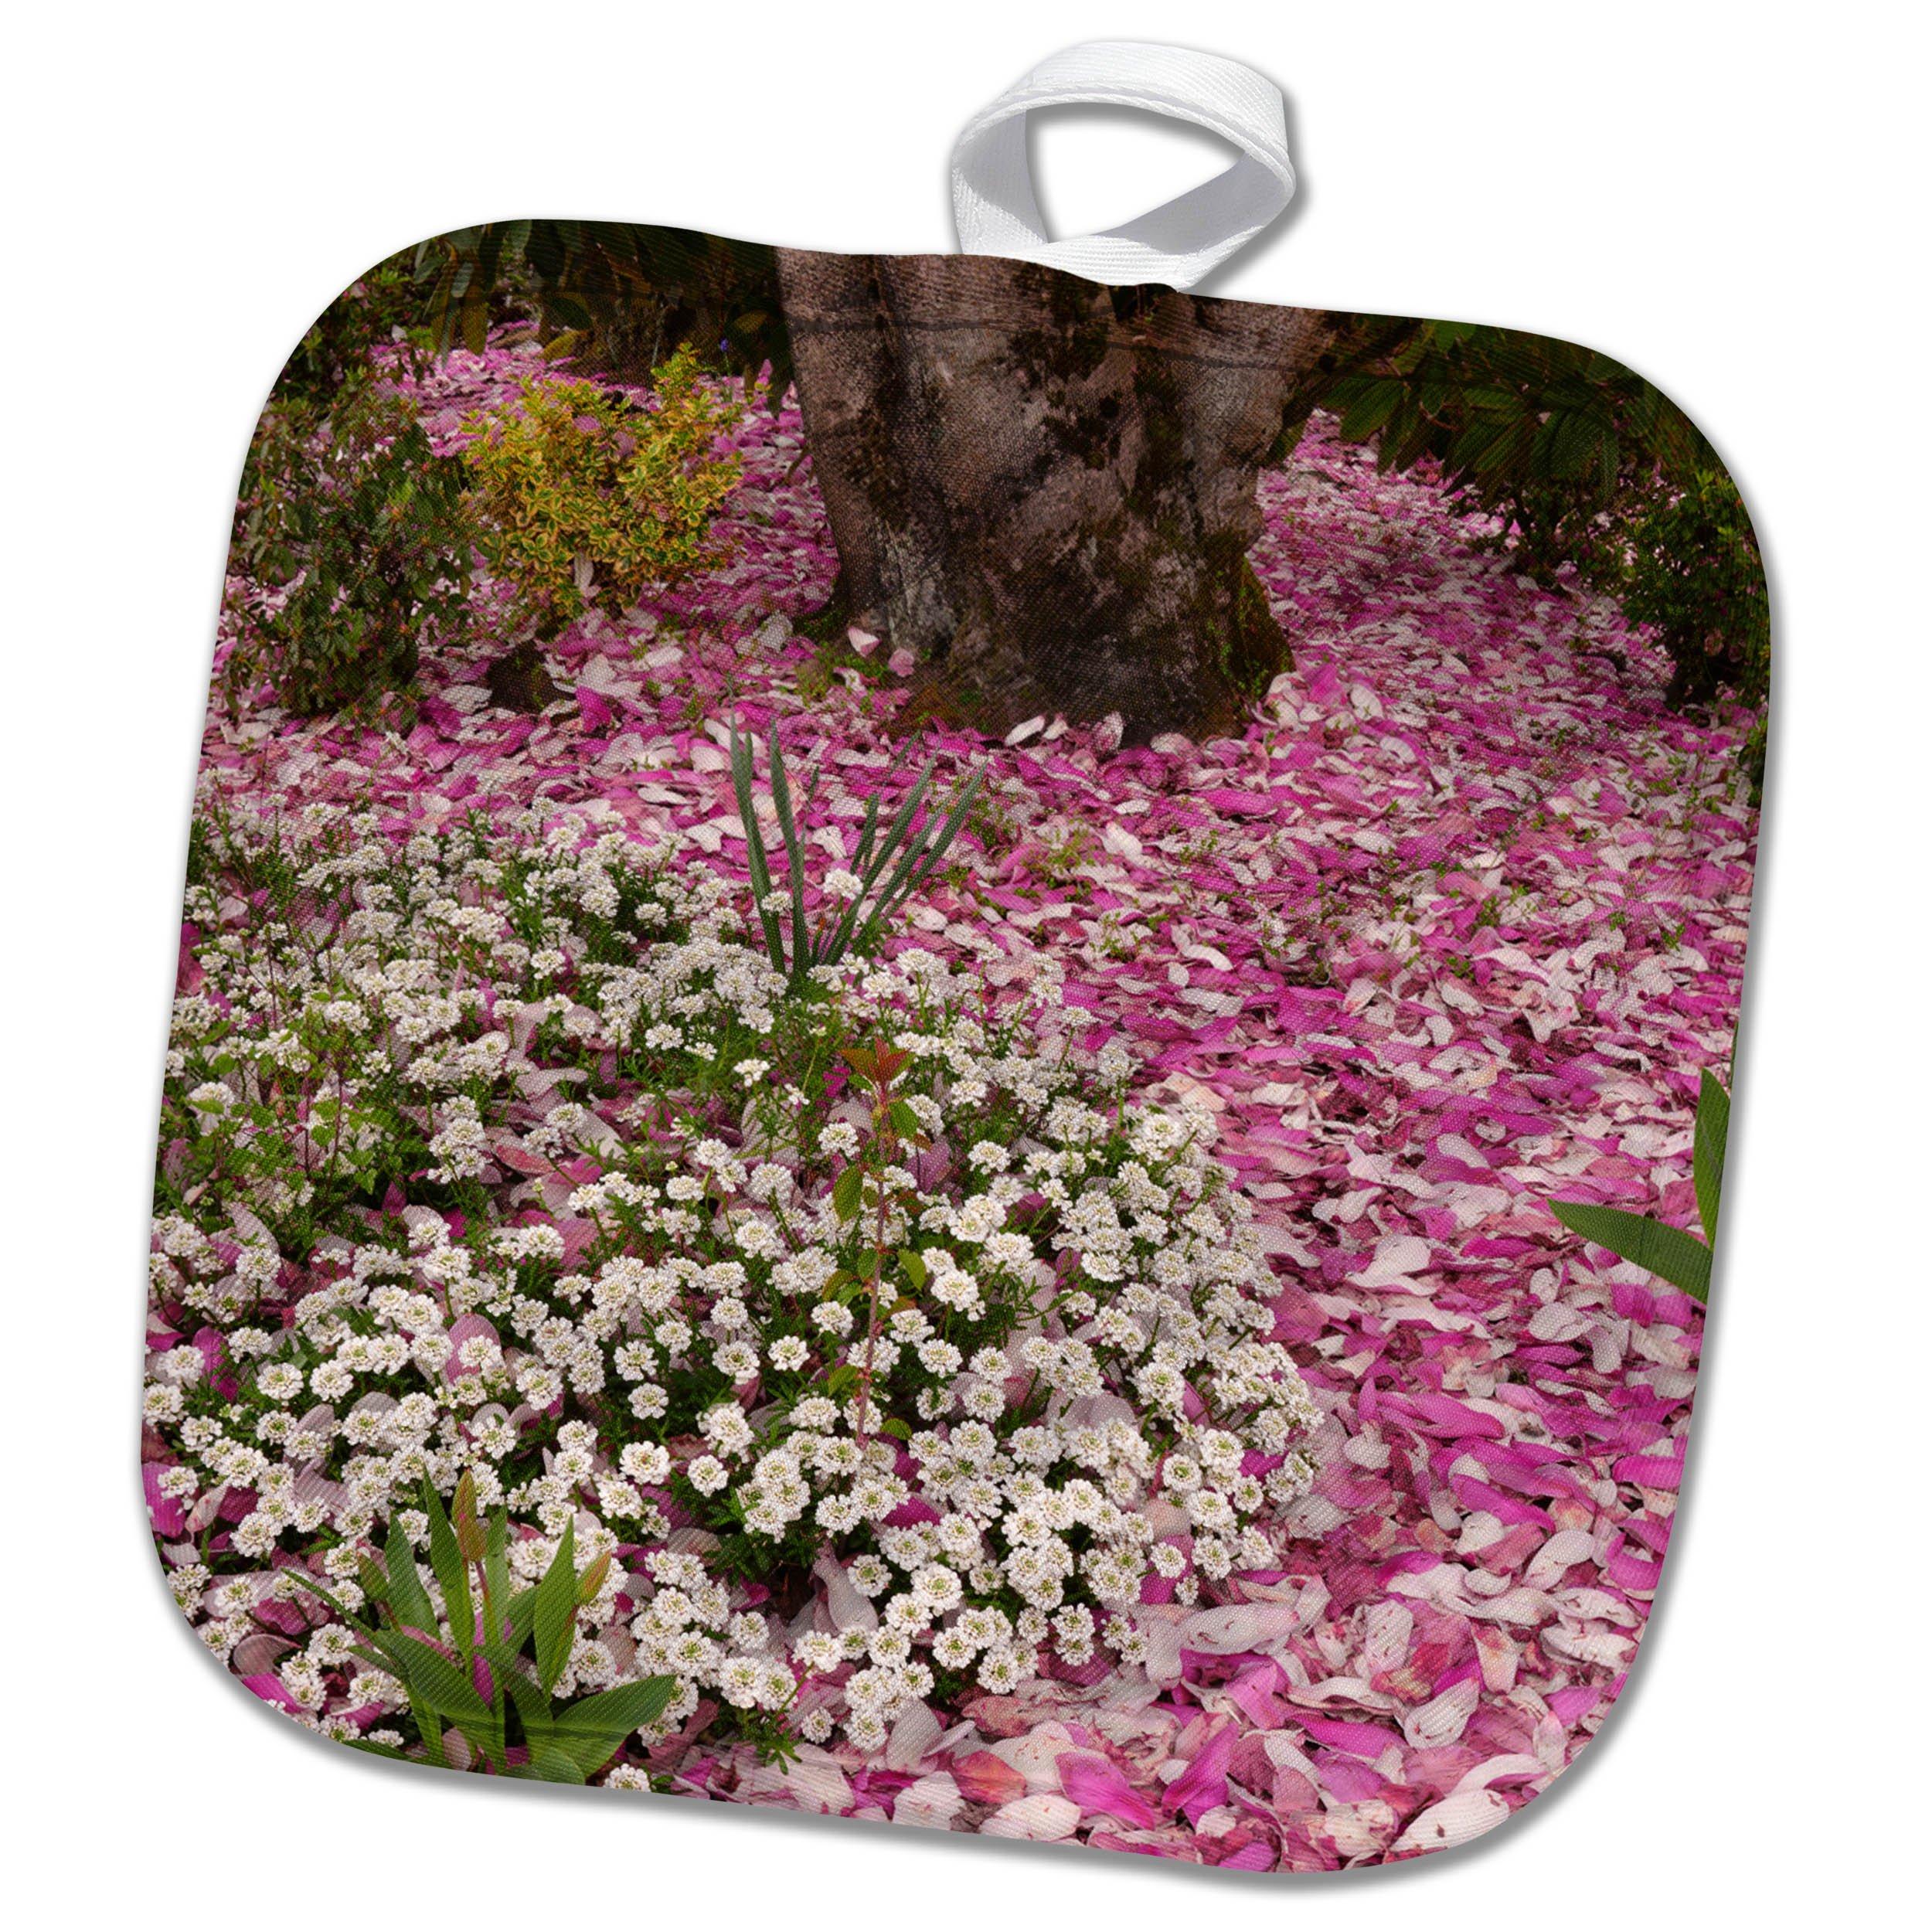 3dRose Danita Delimont - Flowers - USA, Oregon, Portland. Alyssum flowers and magnolia petals. - 8x8 Potholder (phl_279320_1)